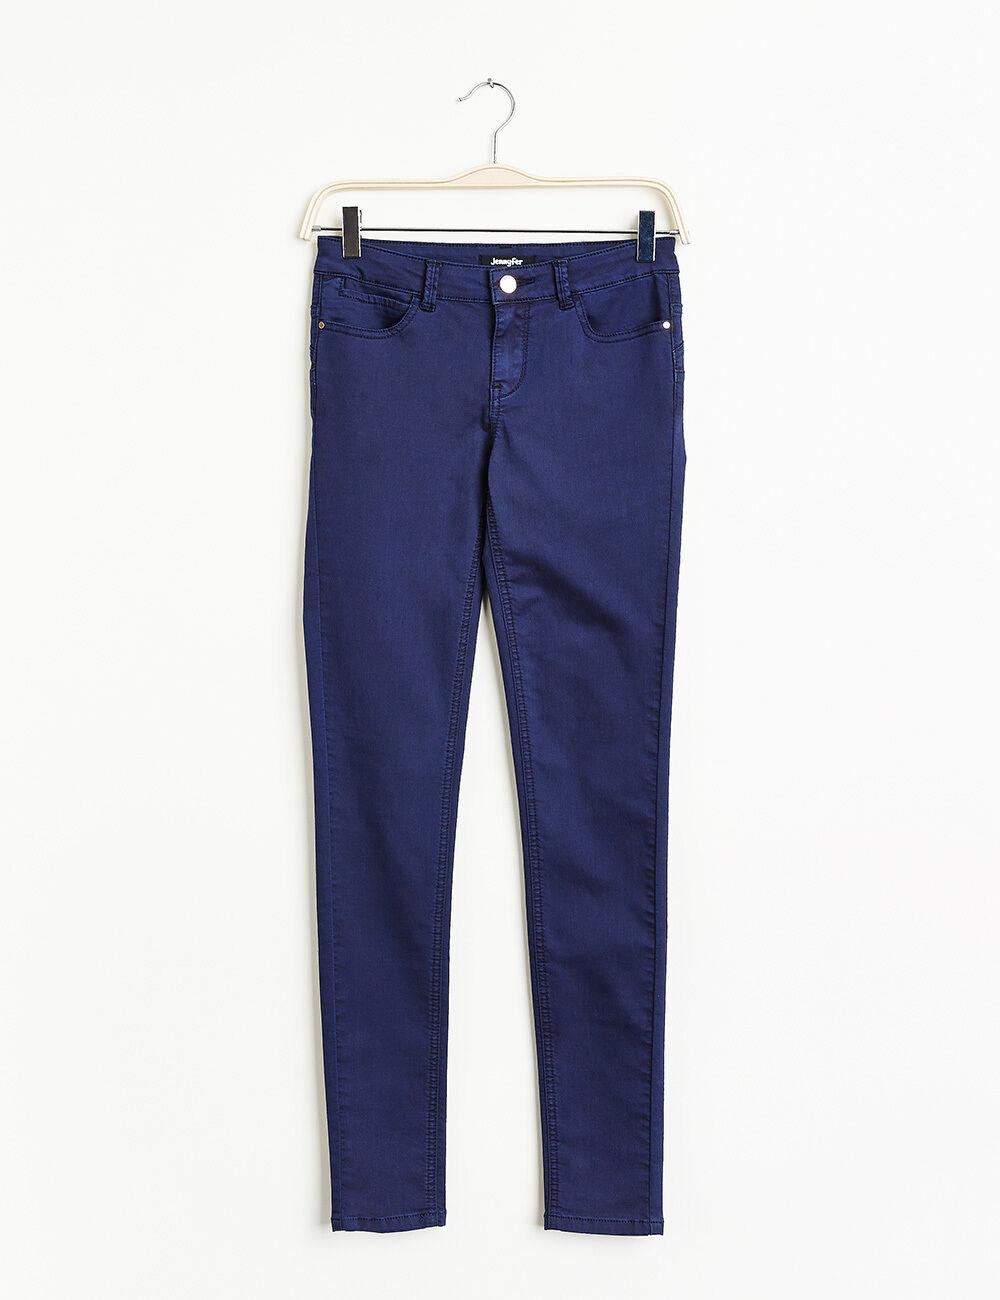 pantalon push up bleu marine femme jennyfer. Black Bedroom Furniture Sets. Home Design Ideas